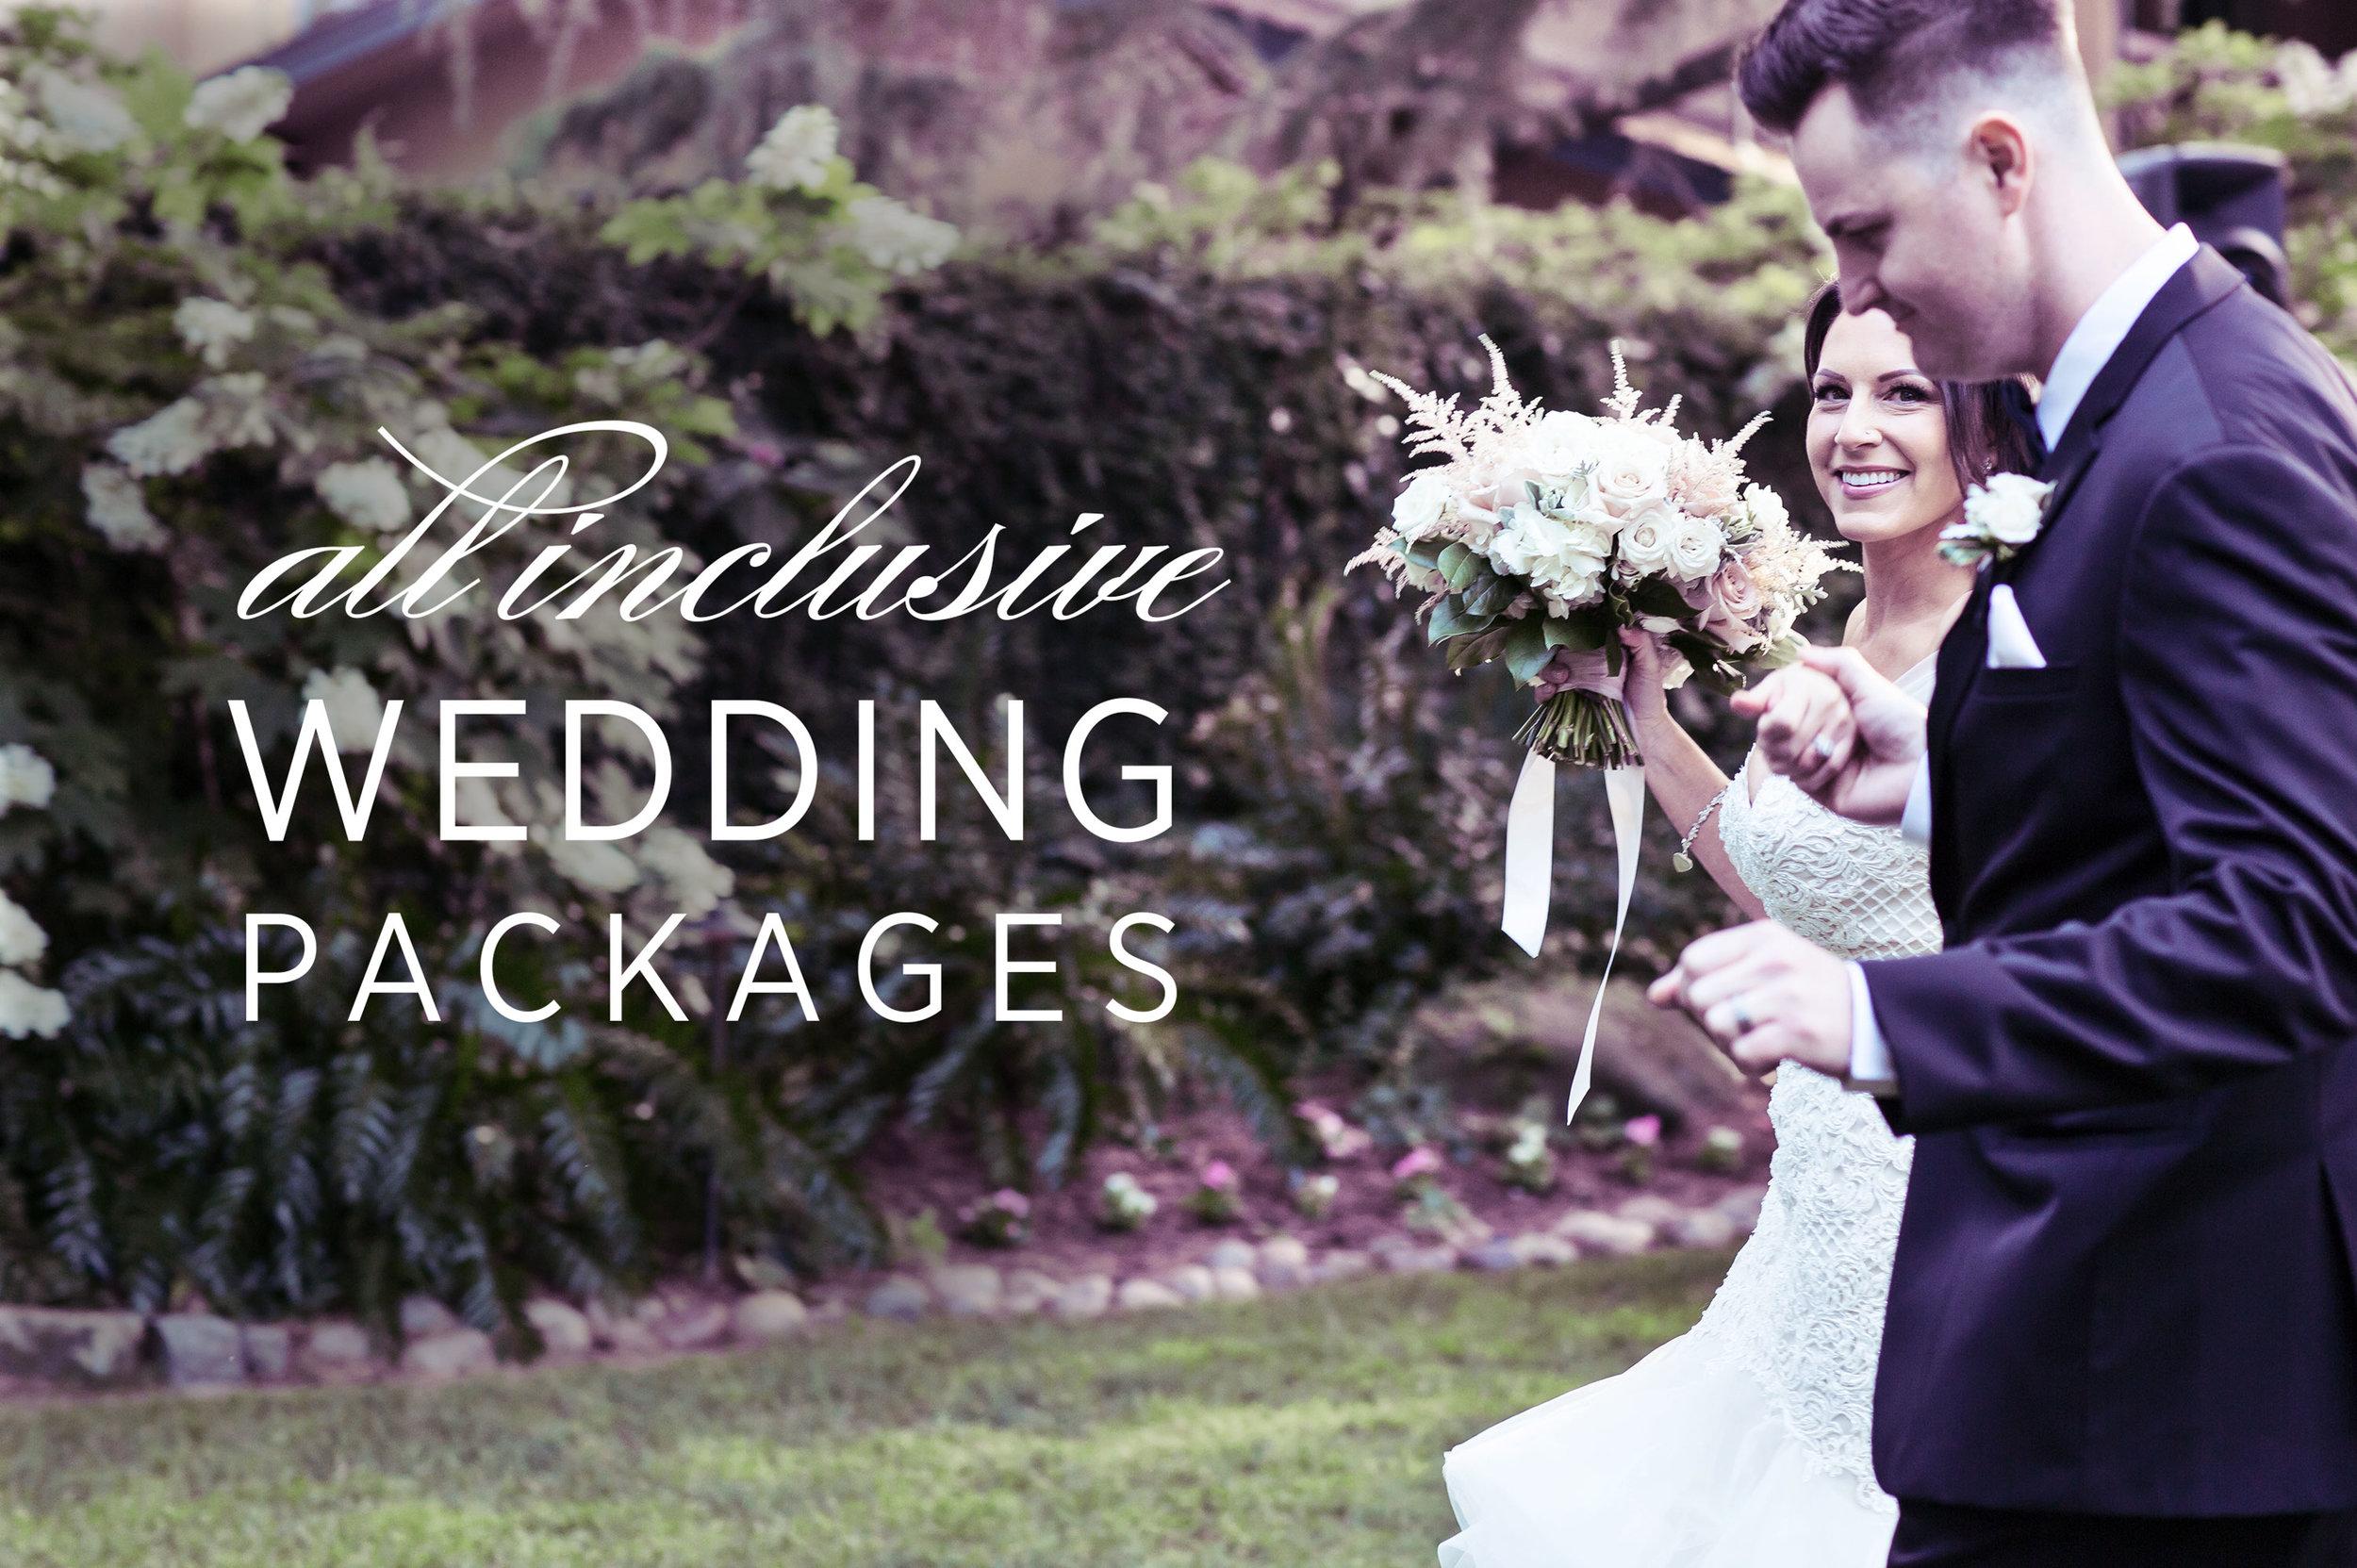 photo of bride and groom walking through wedding garden